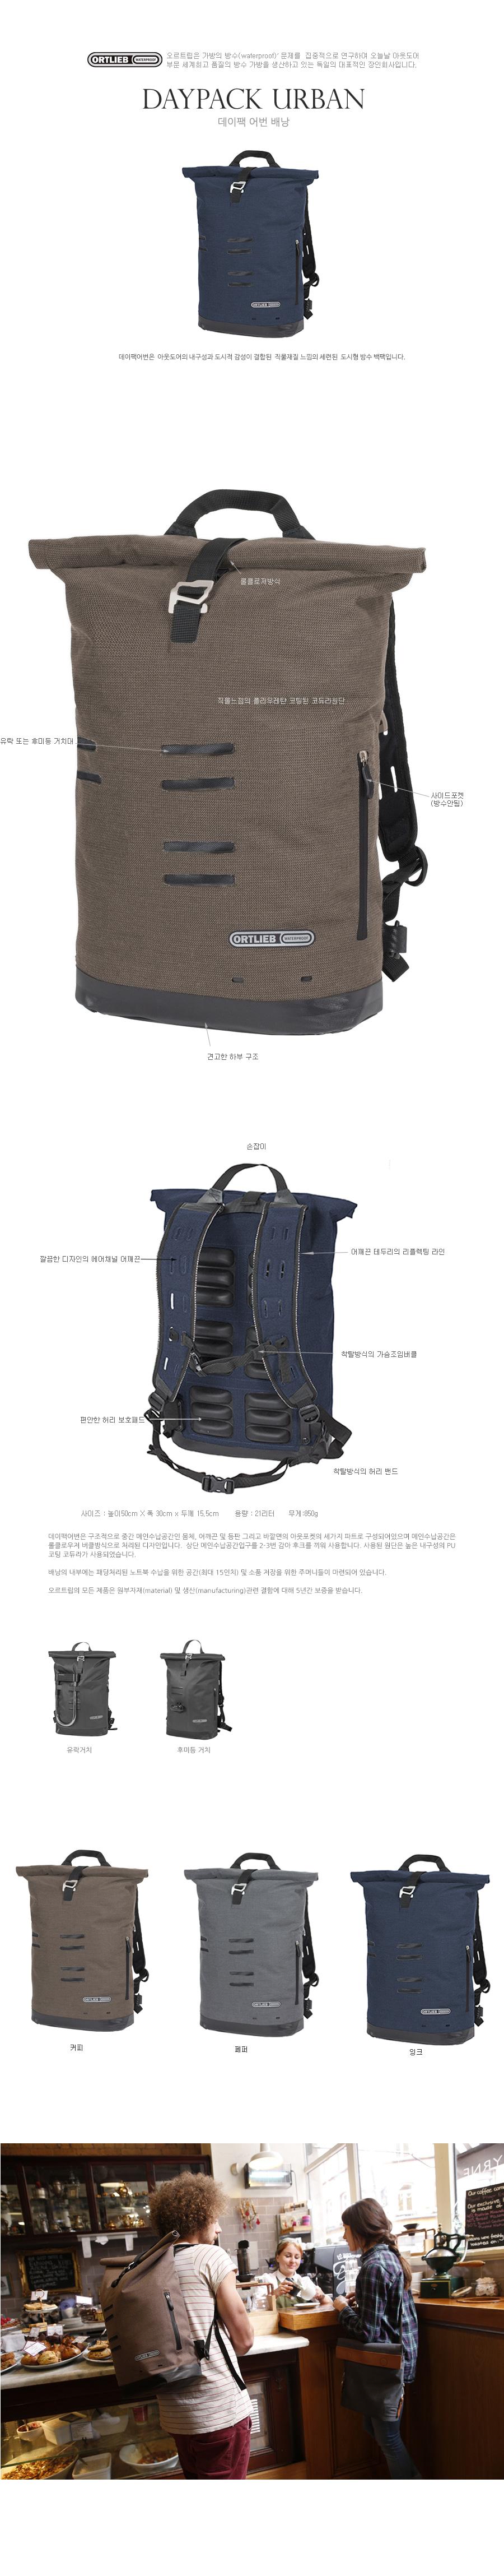 daypack-urban.jpg